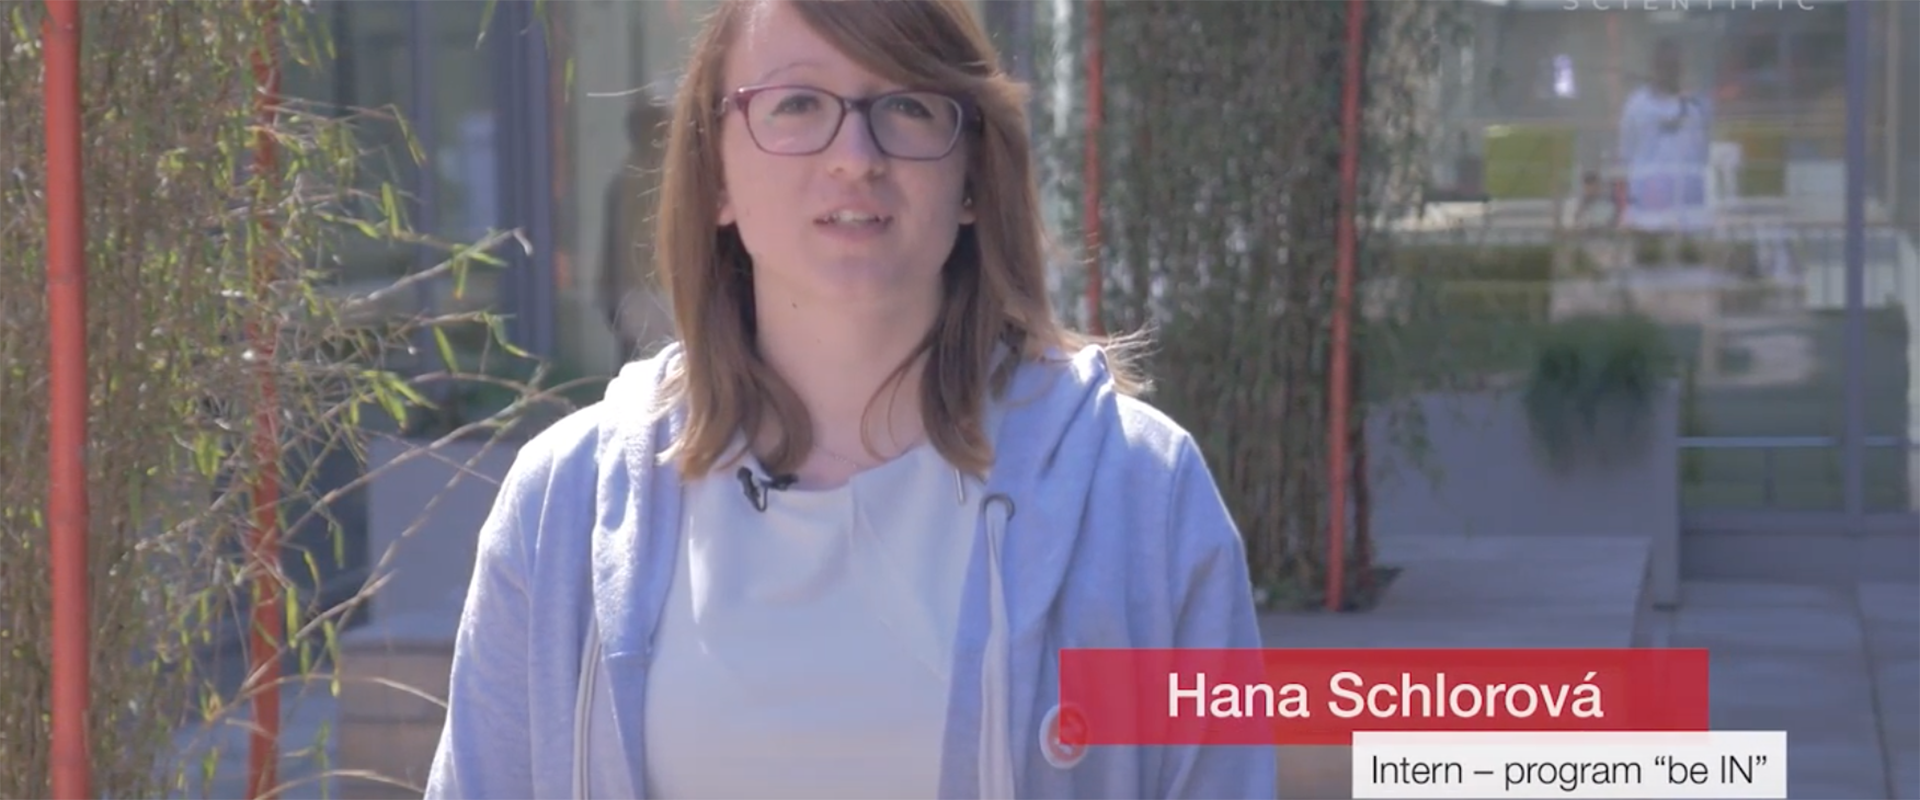 Hana Schlorova Intern - program be IN